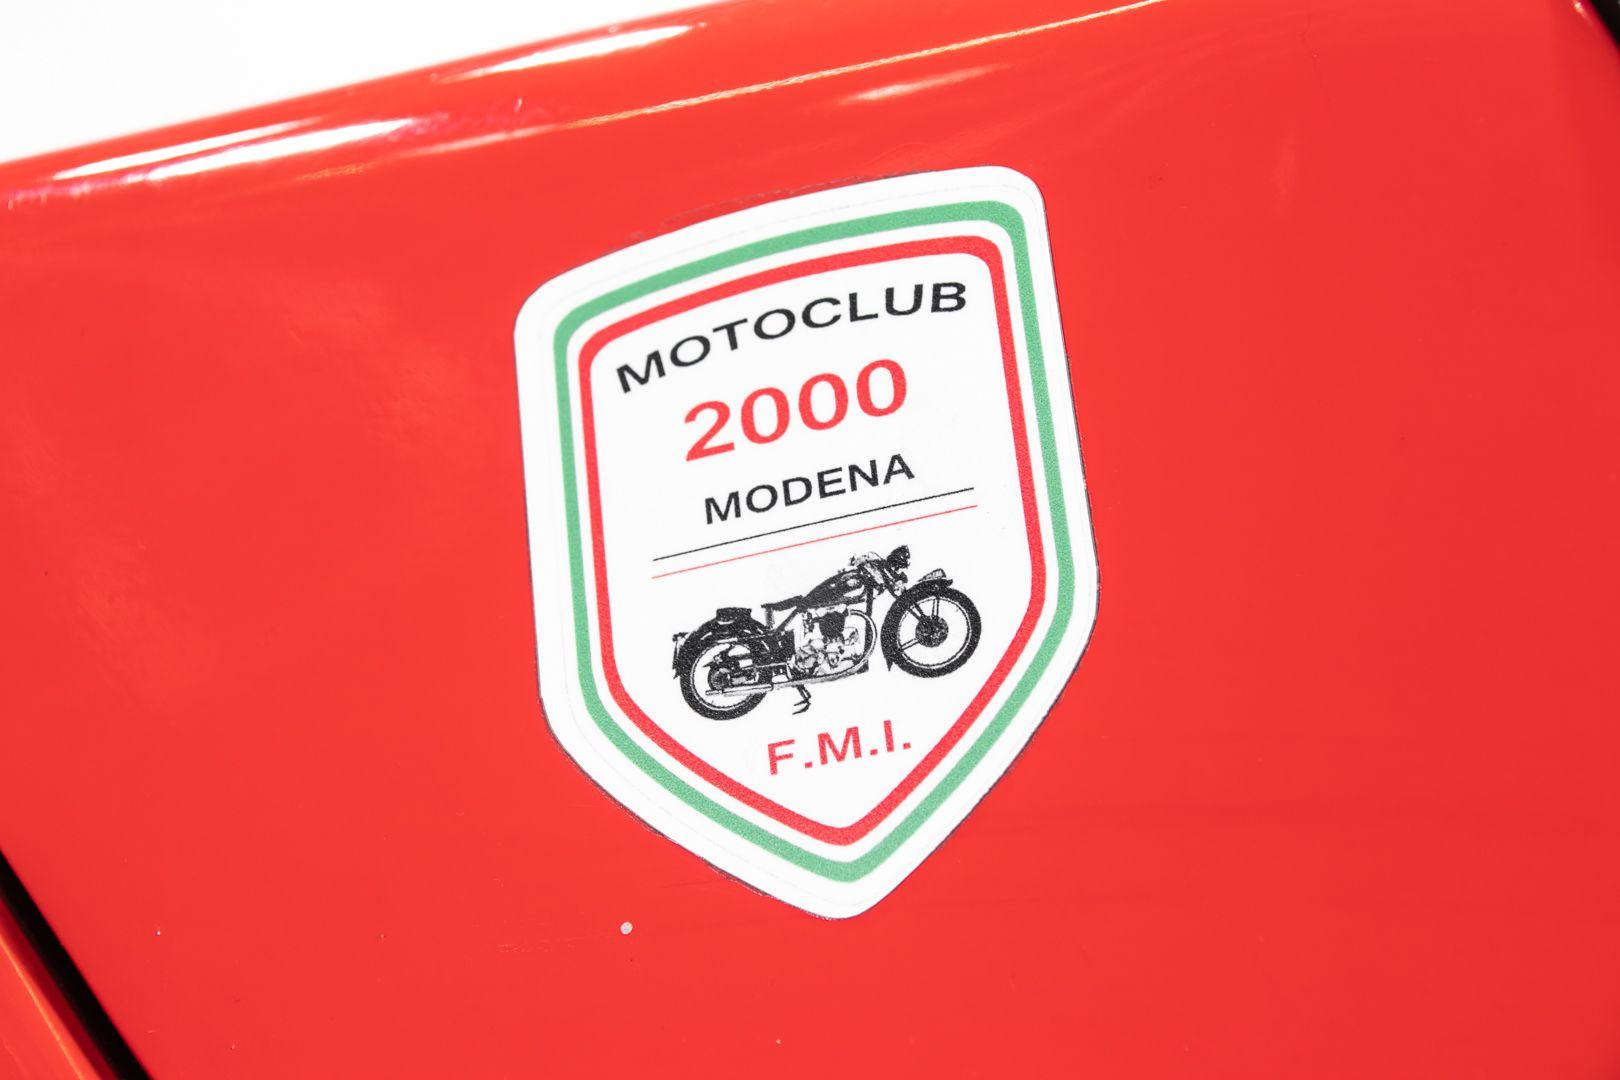 1983 Ducati 900 Mike Hailwood Replica 71434